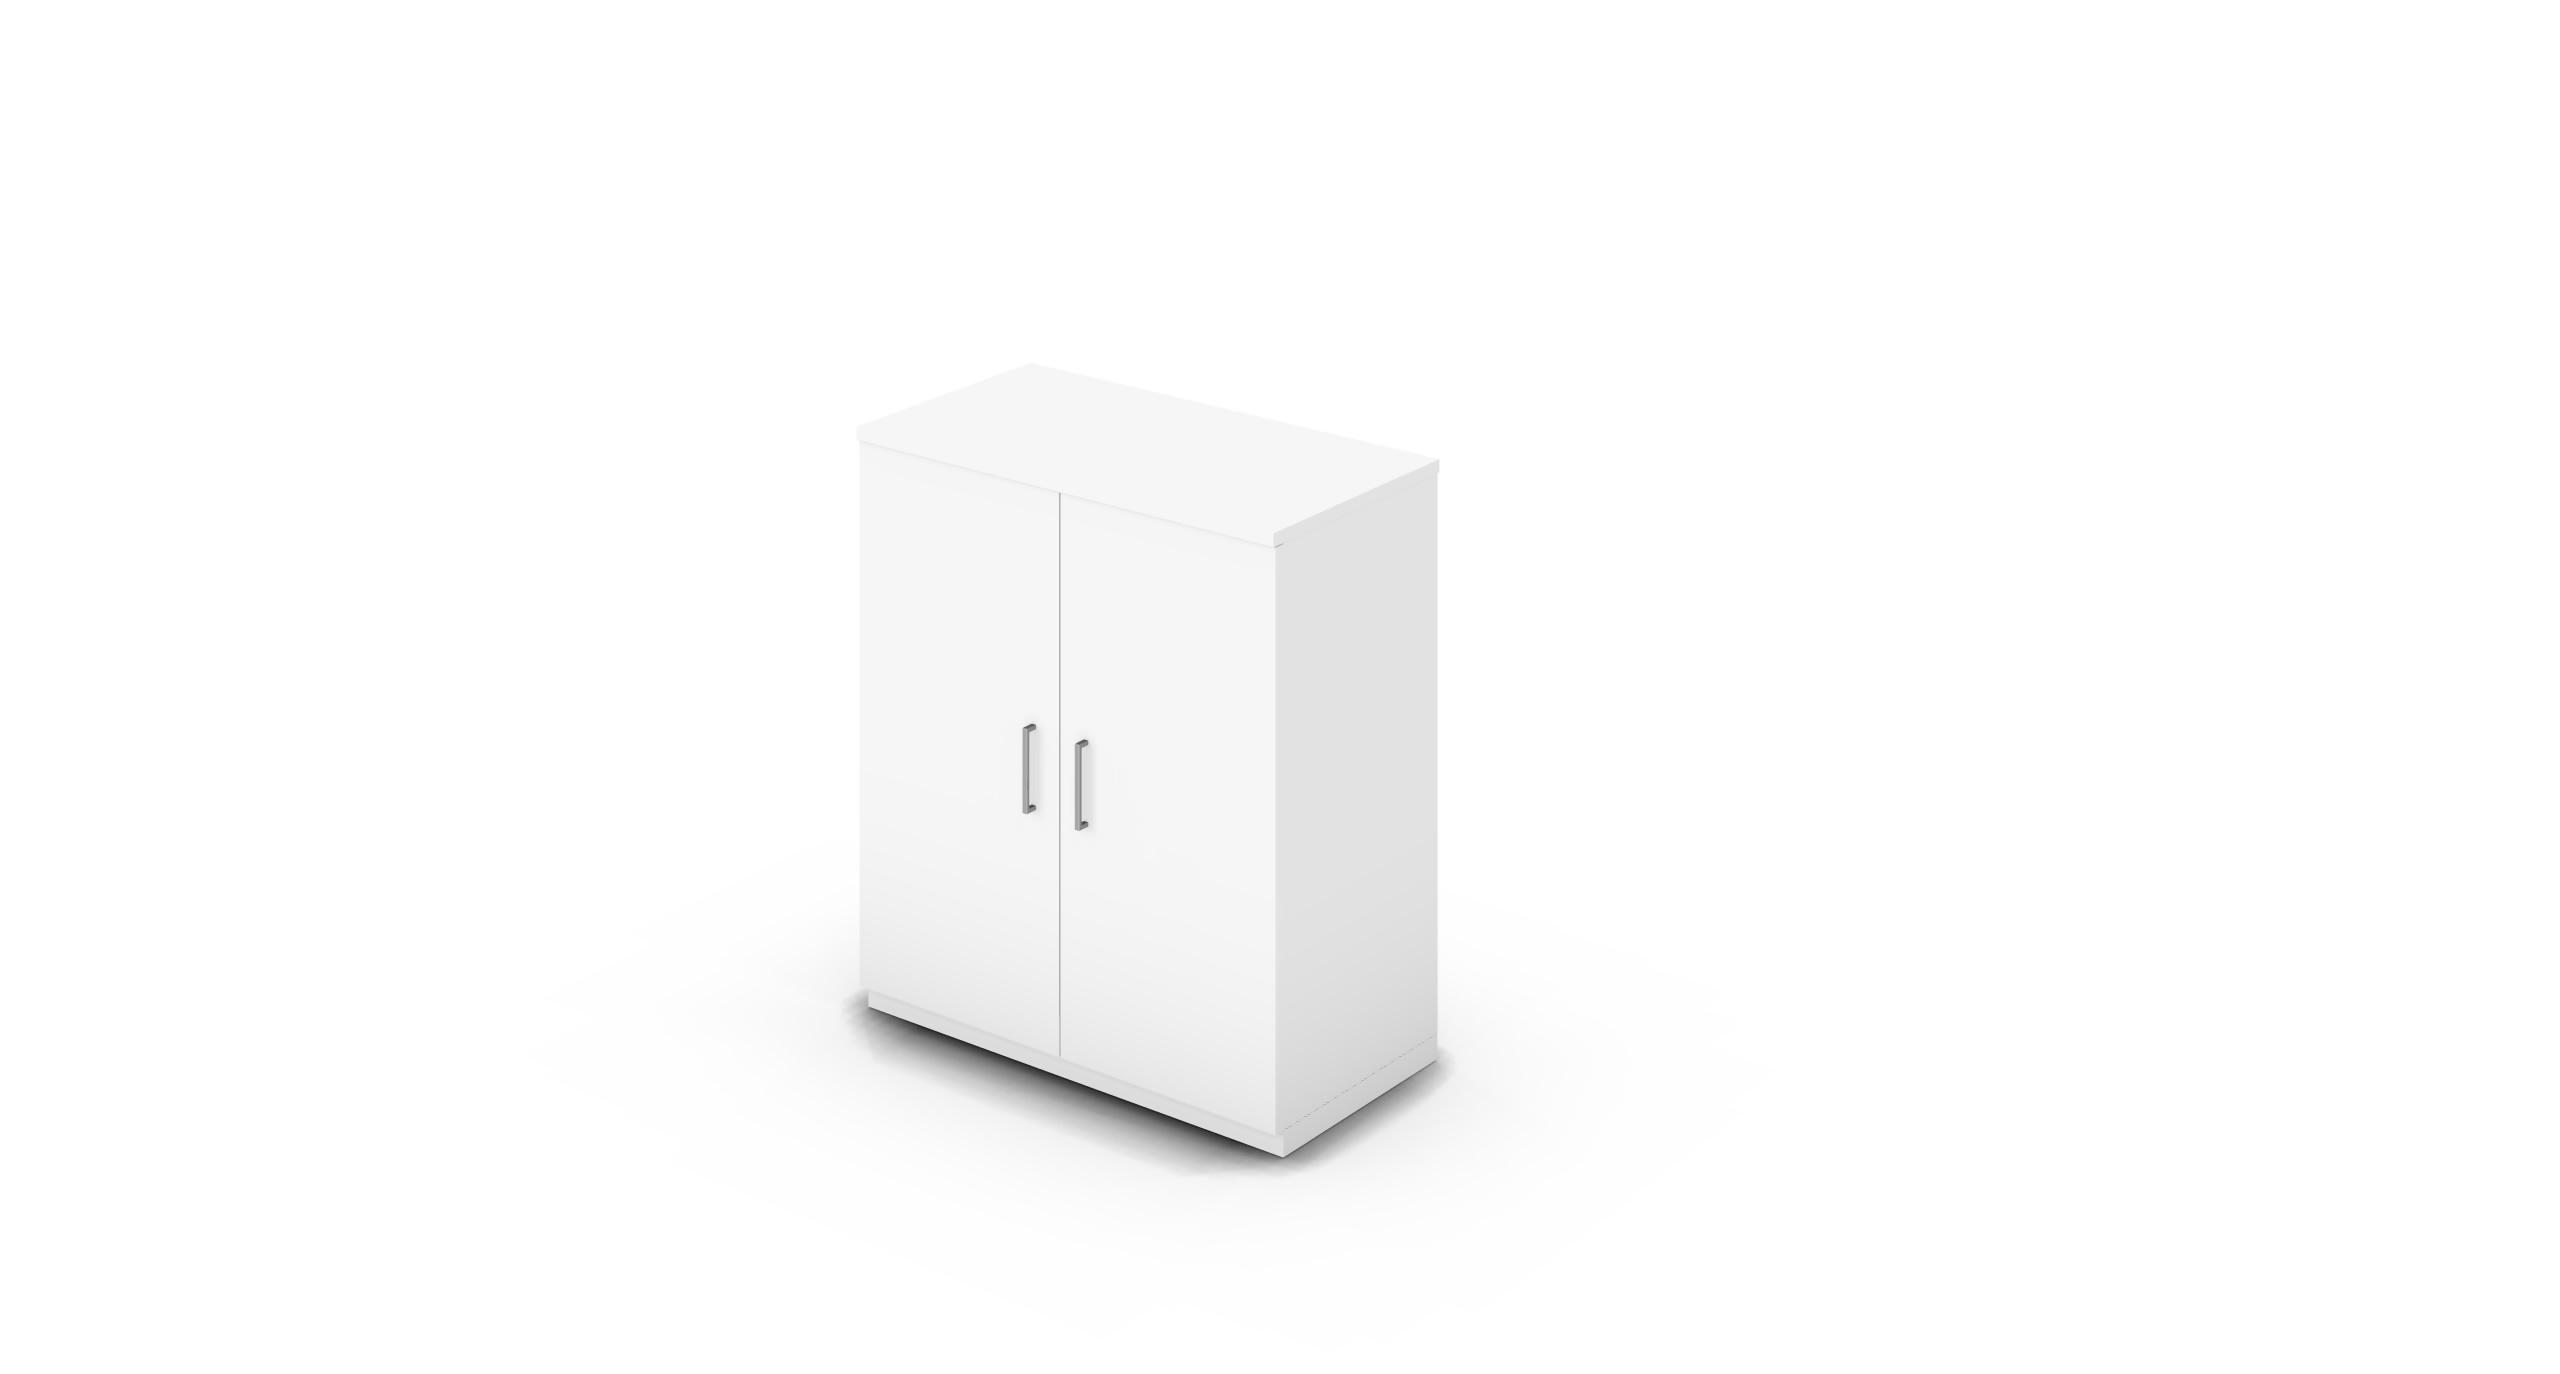 Cabinet_900x450x1125_HD_White_Bar_Square_NoCylinder